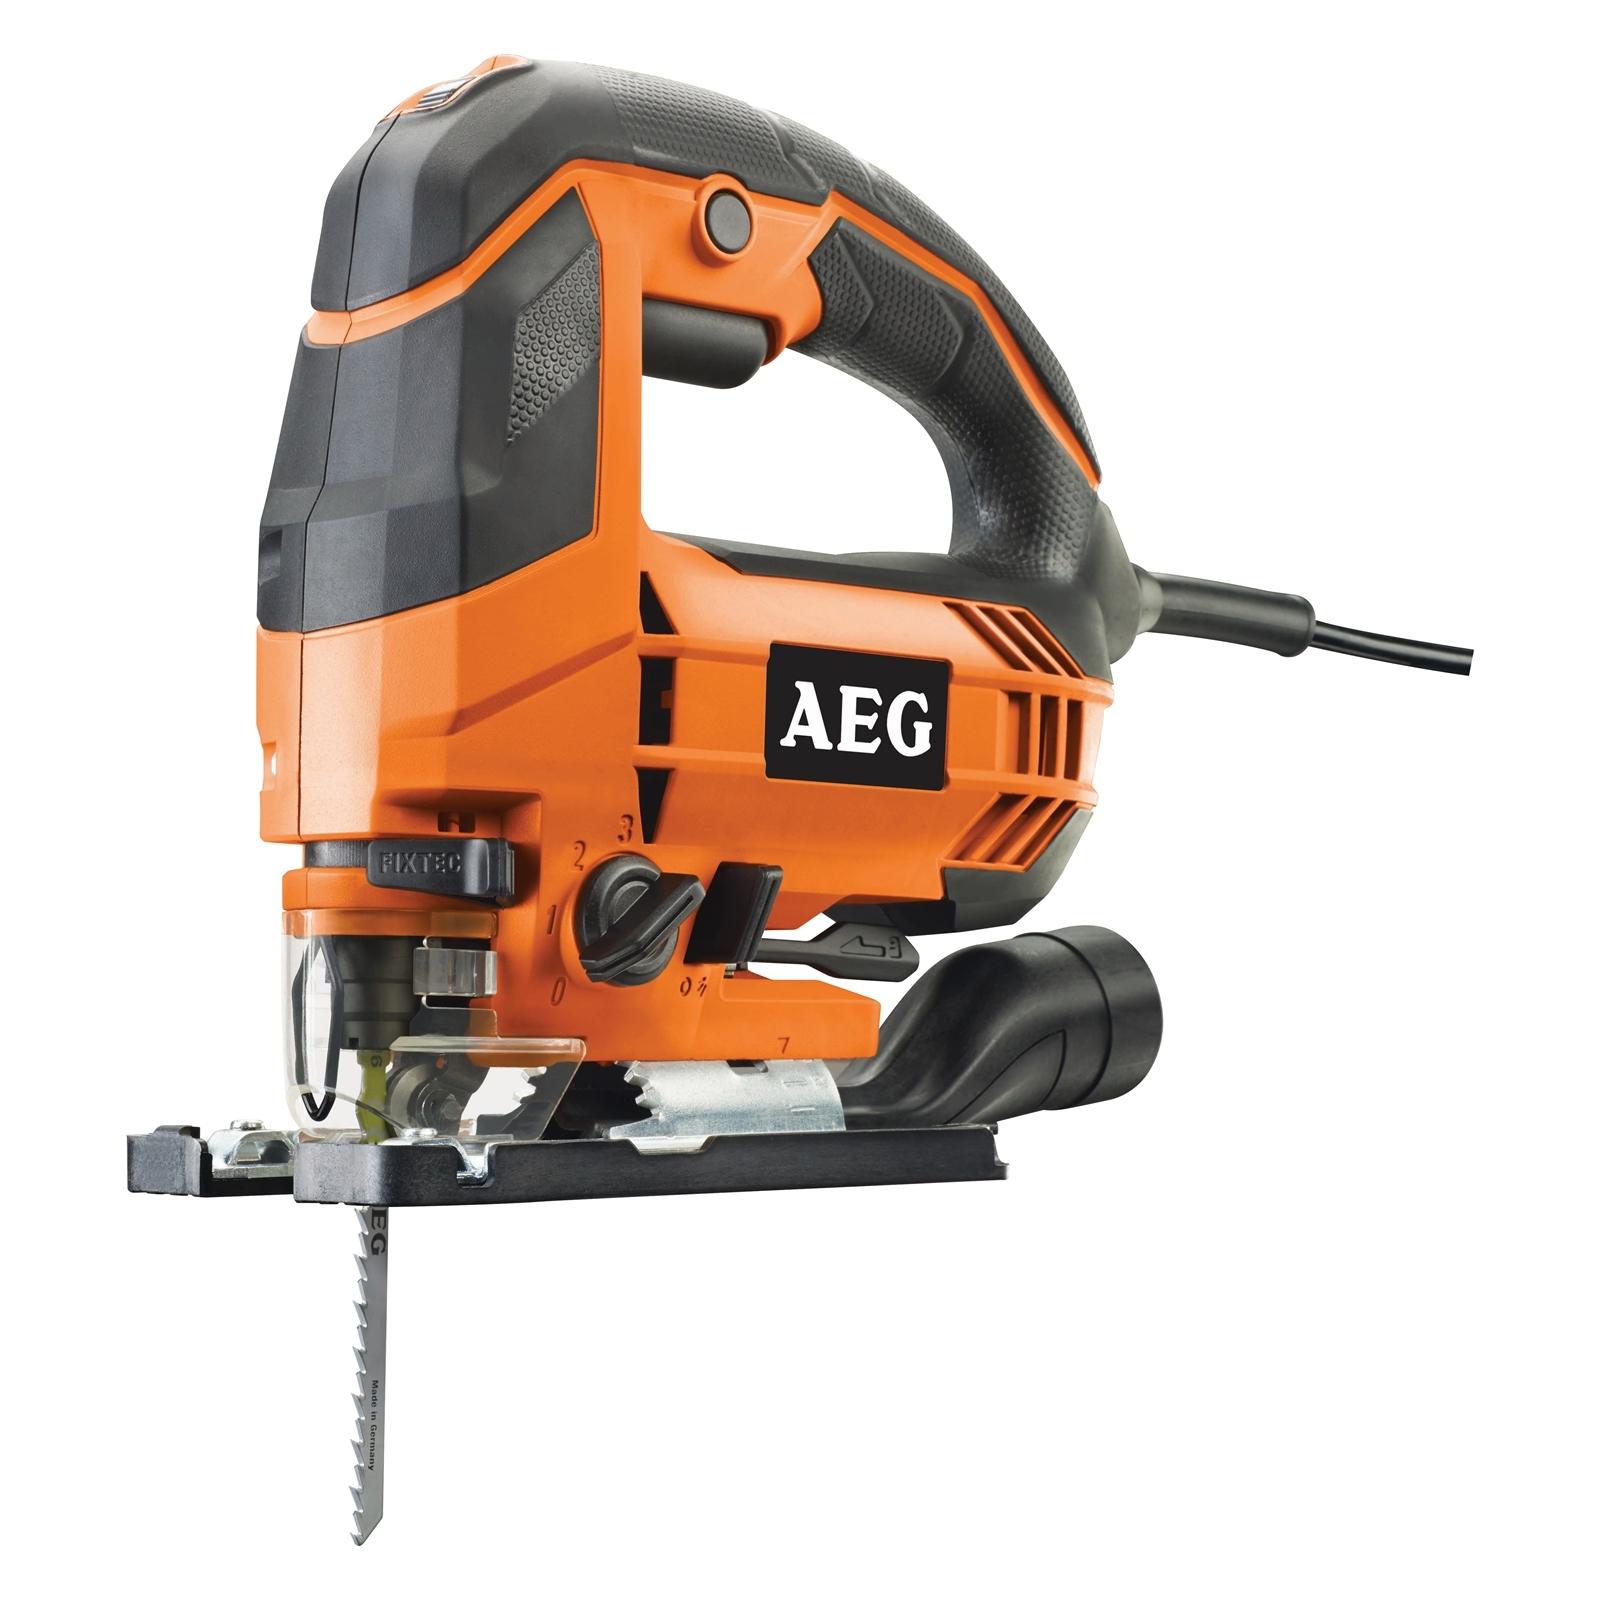 AEG 700W Variable Speed Jigsaw